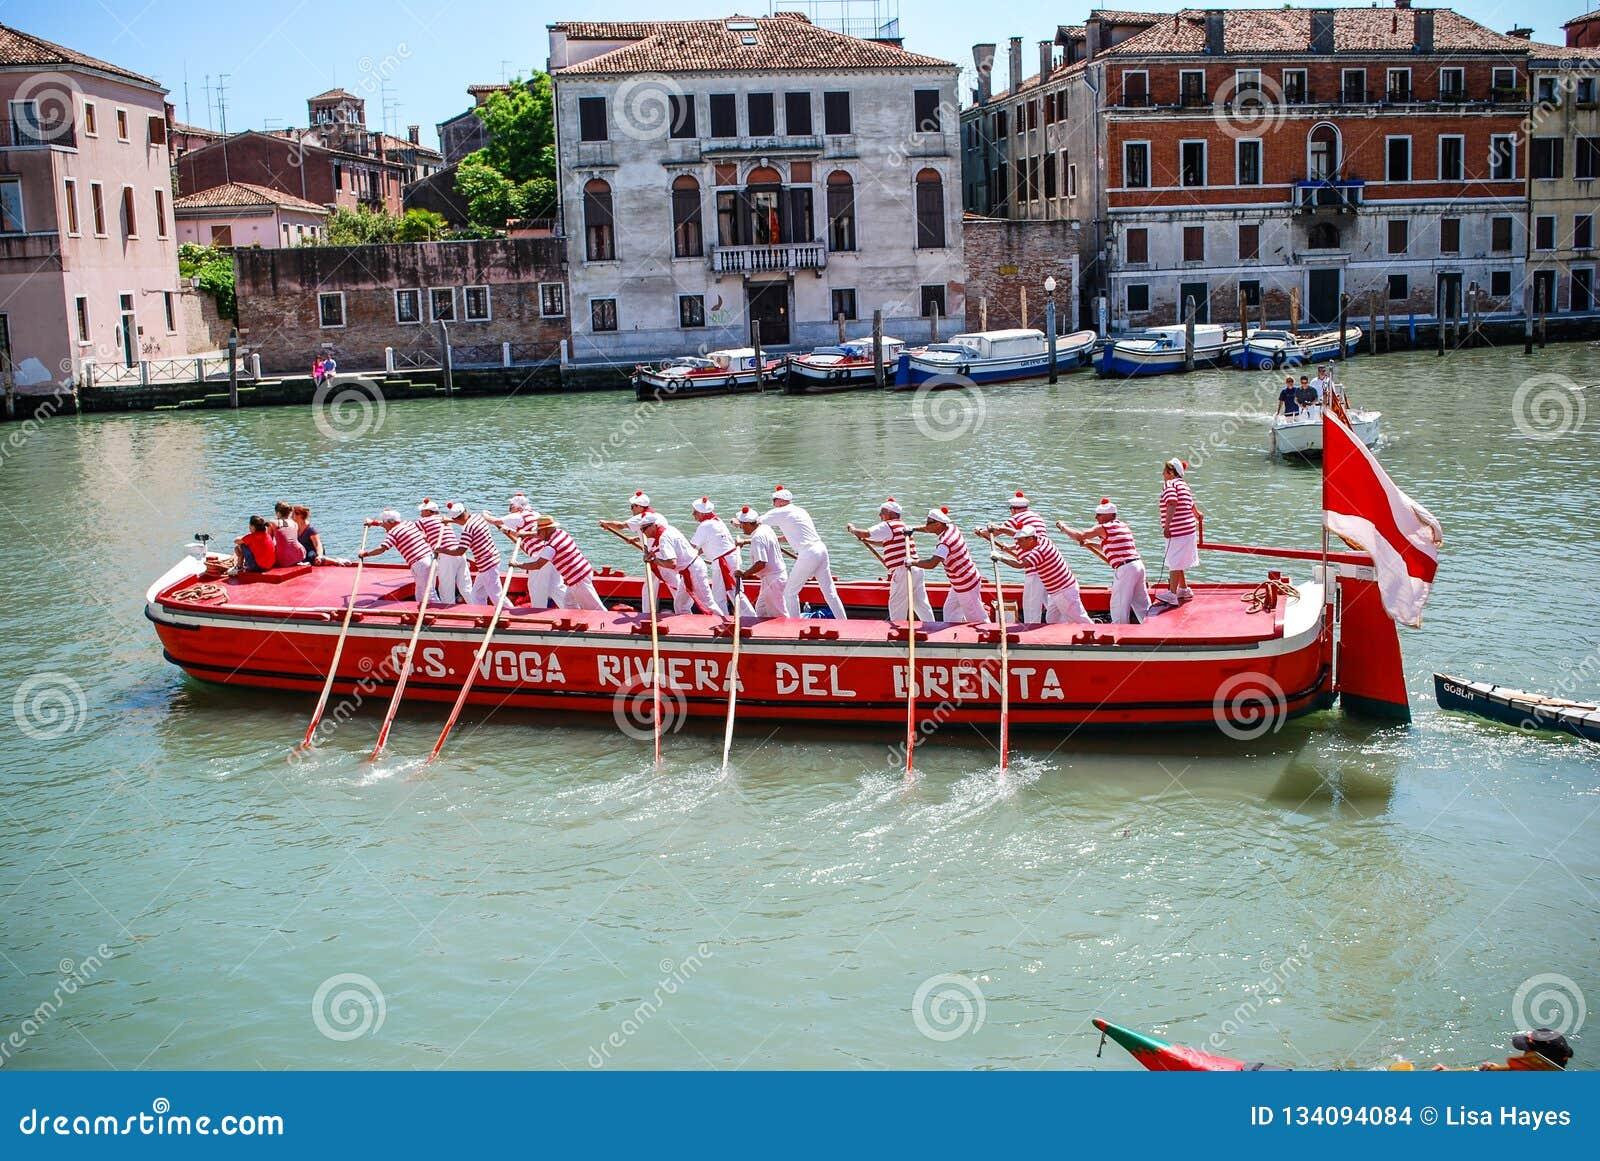 Gondeliers que compete no Regata Storica, Veneza, Itália